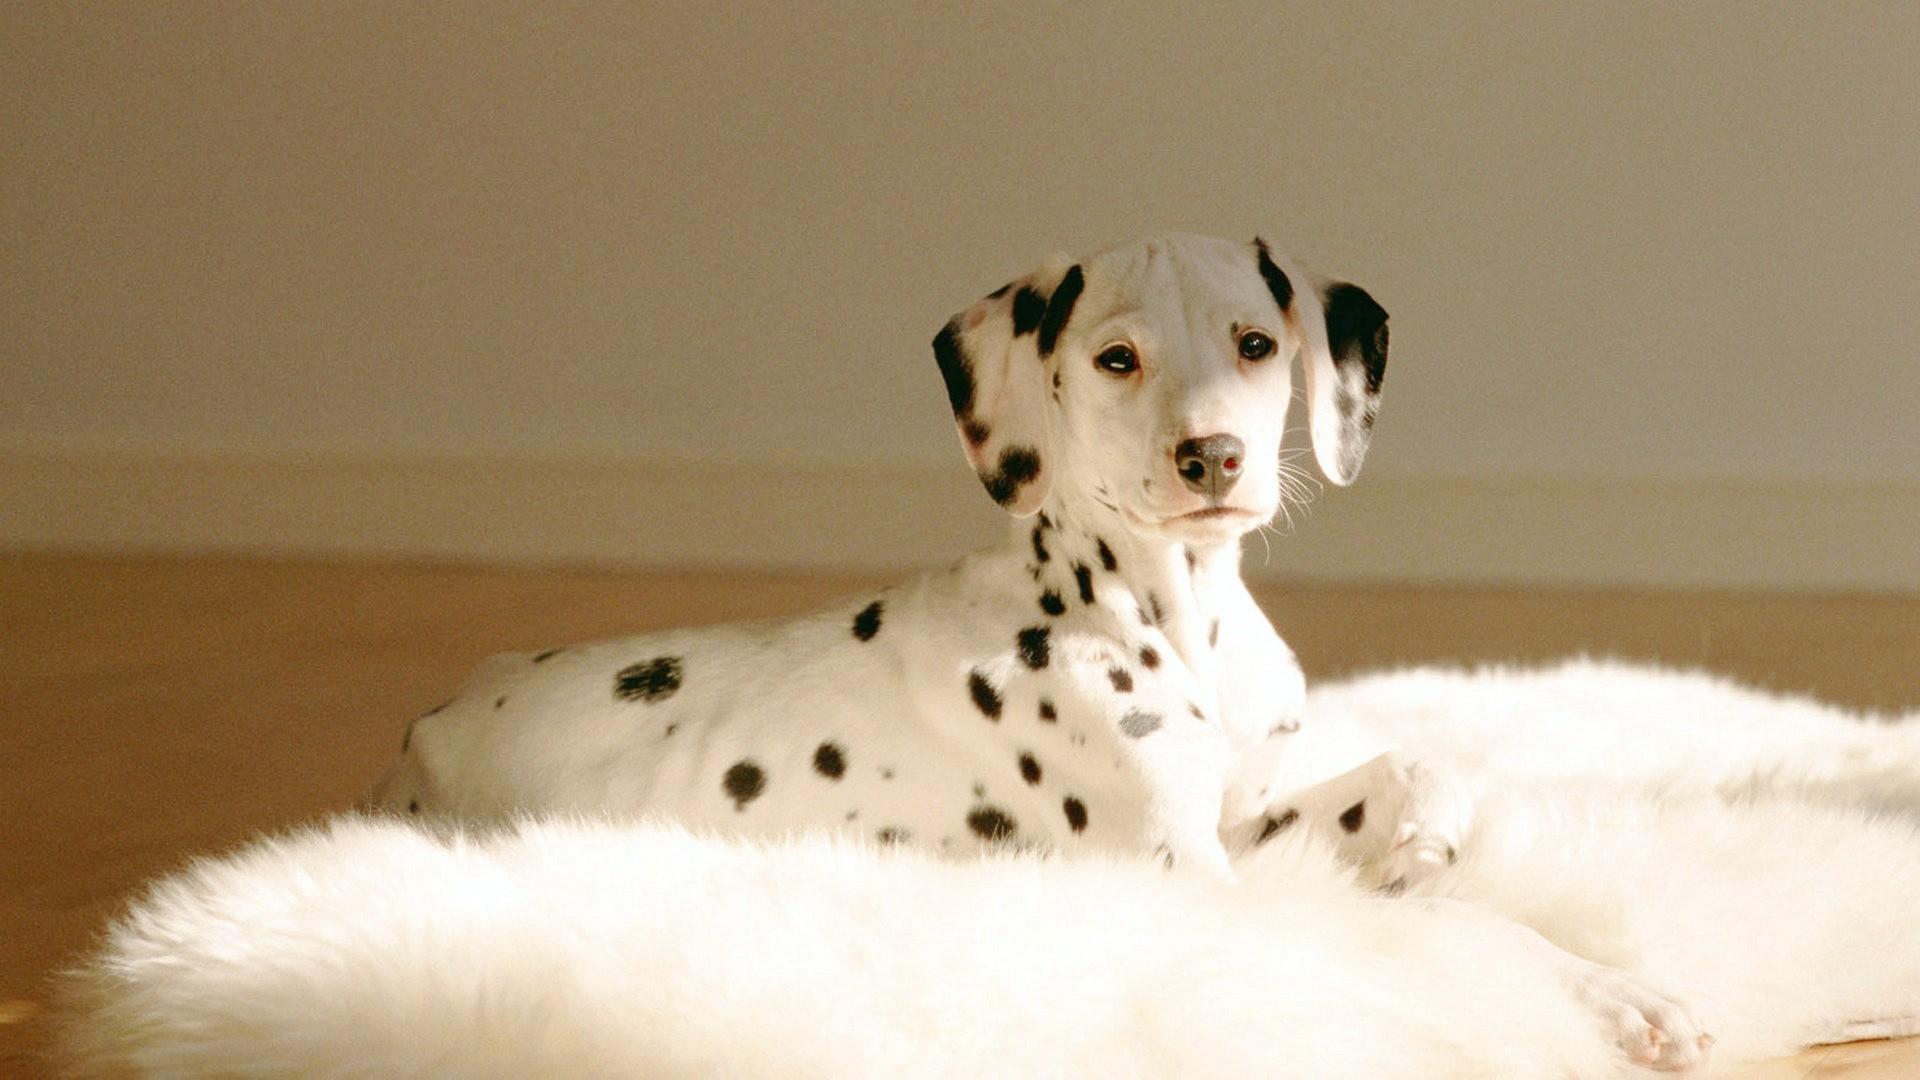 Download Wallpaper Of Cute Puppies Dalmatian Wallpaper 55 Images